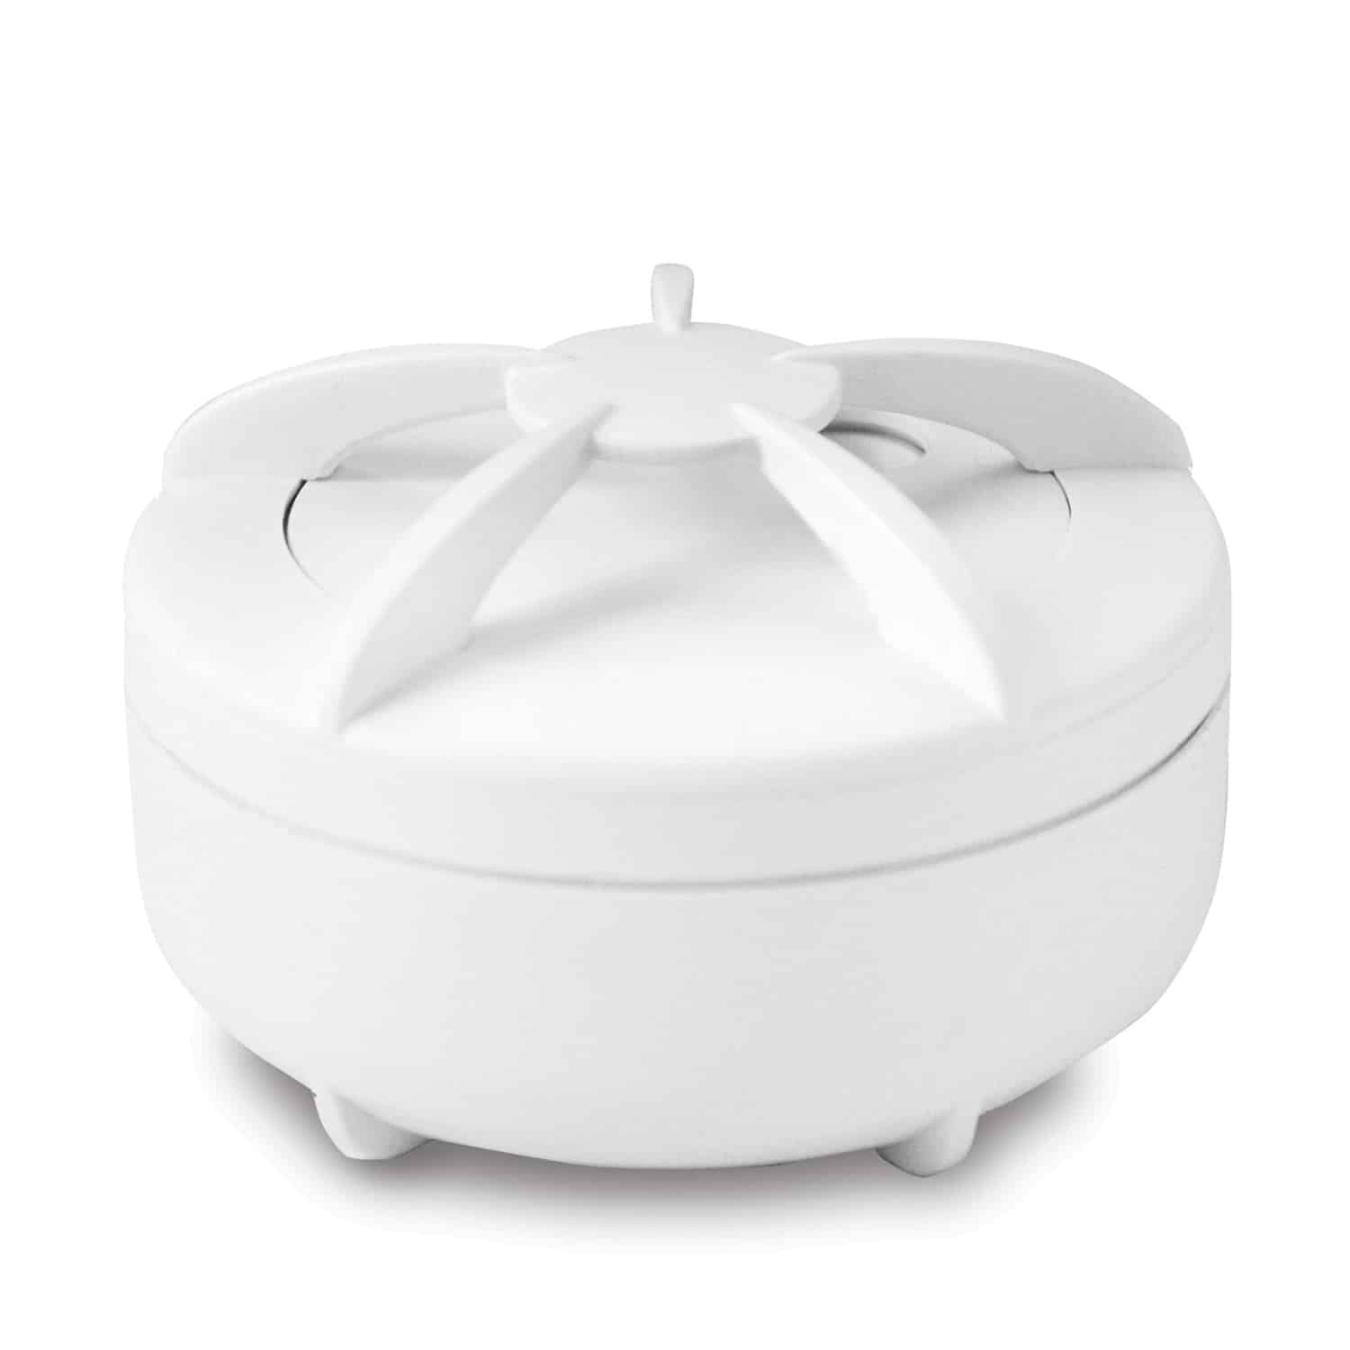 Koop Cavius 5103-003 Watermelder – draadloos koppelbaar